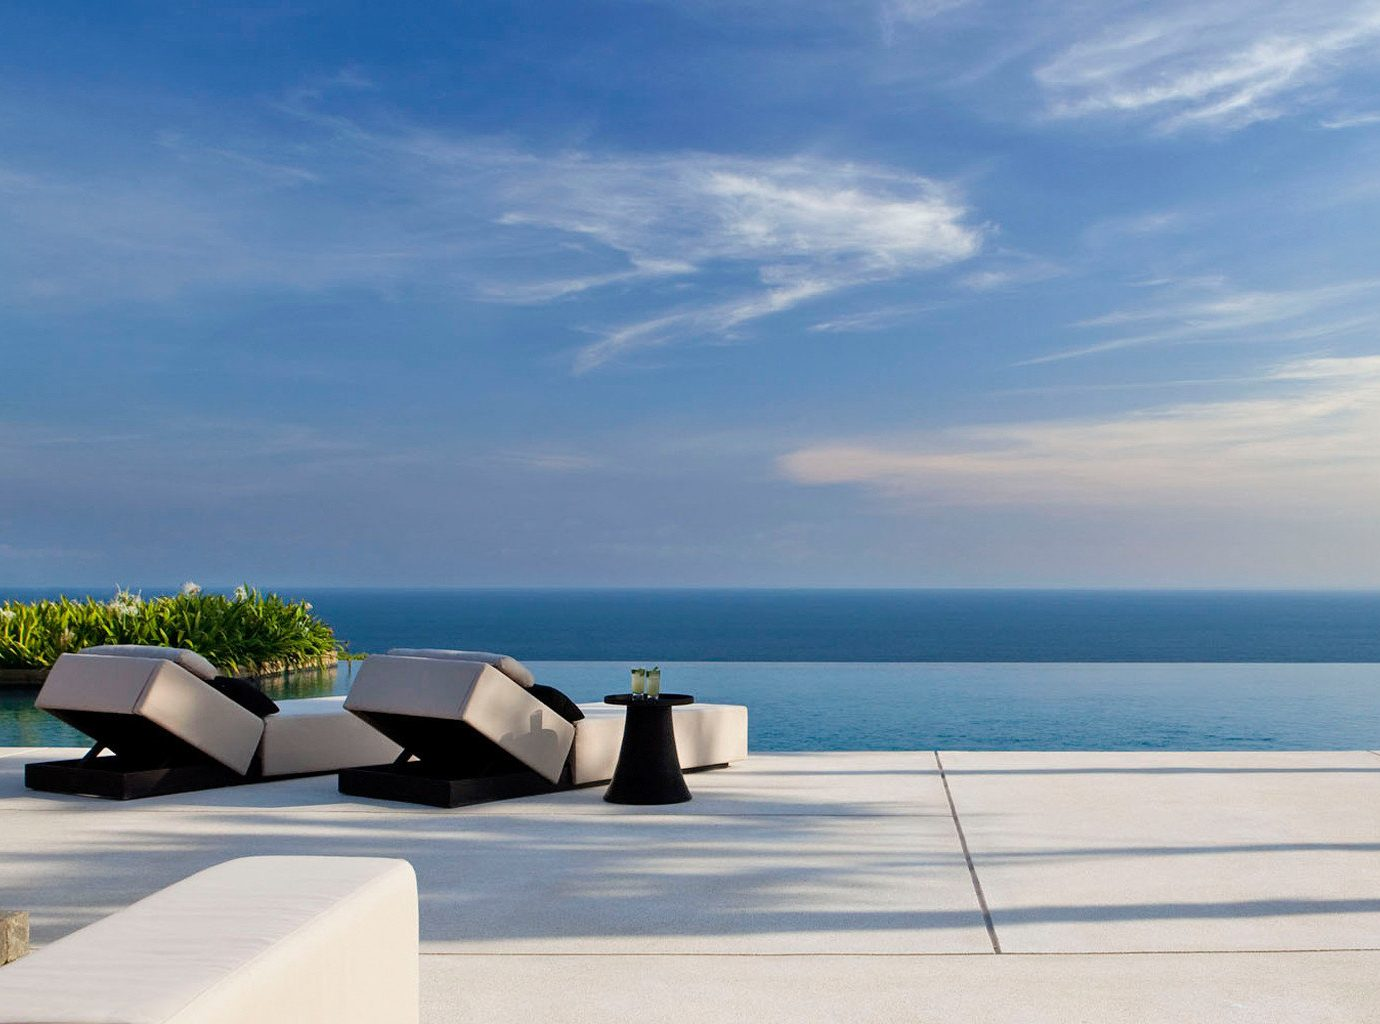 Eco Hotels Luxury Modern Pool Scenic views Waterfront sky outdoor horizon Sea Ocean vacation swimming pool Coast Beach bay condominium shore day